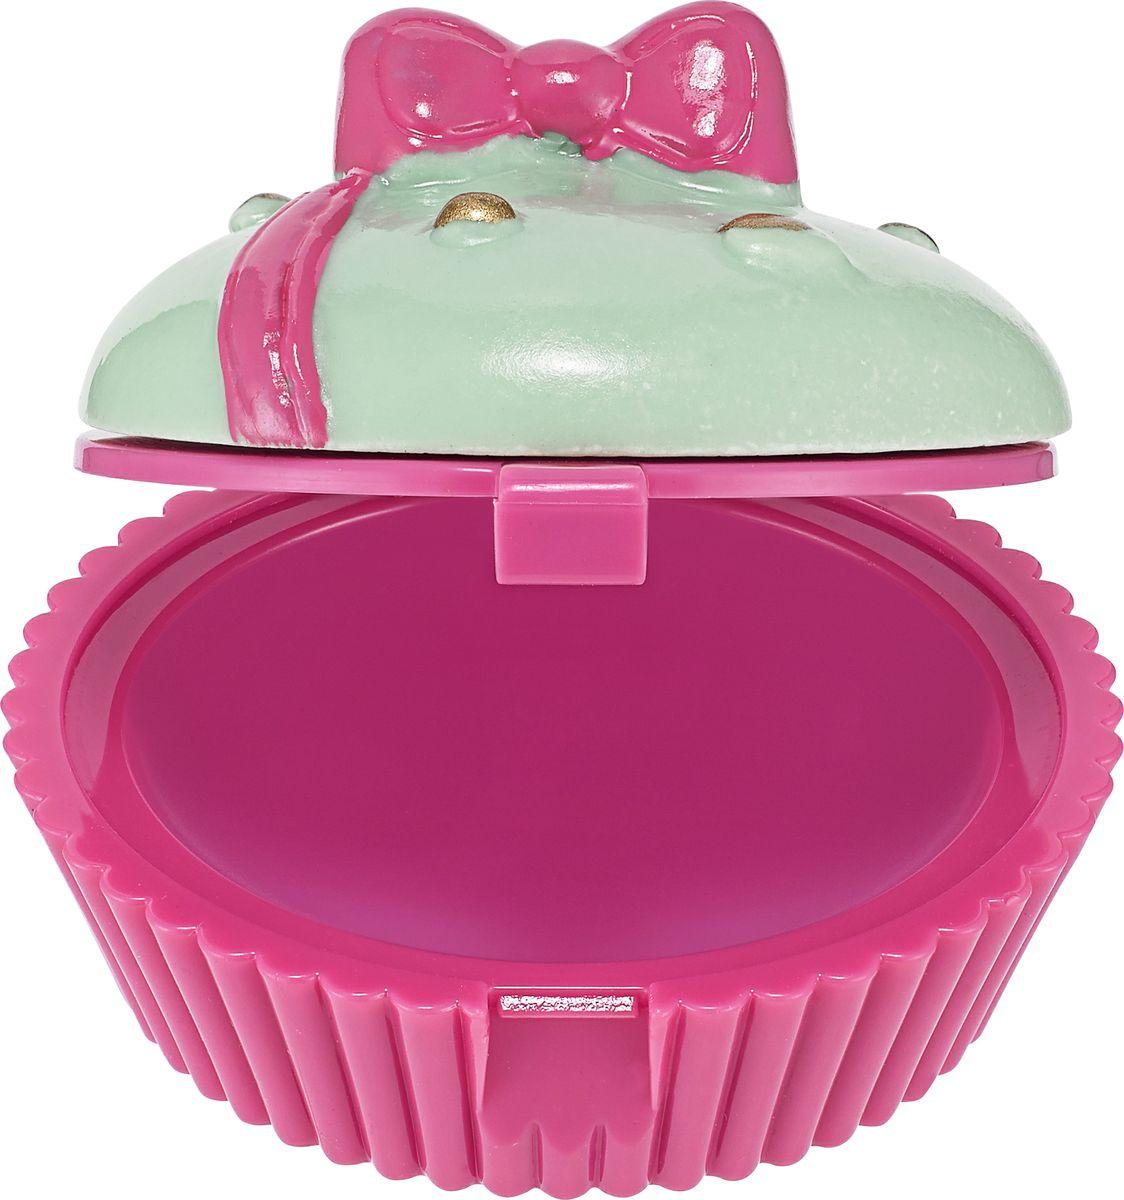 Holika Holika Бальзам для губ Дессерт тайм, тон 02, розовое пирожное, 7 г200141826644 Holika Holika Dessert Time Lip Balm AD02 (Pink Cup Cake) Бальзам для губ Время десерта (Розовое пирожное).